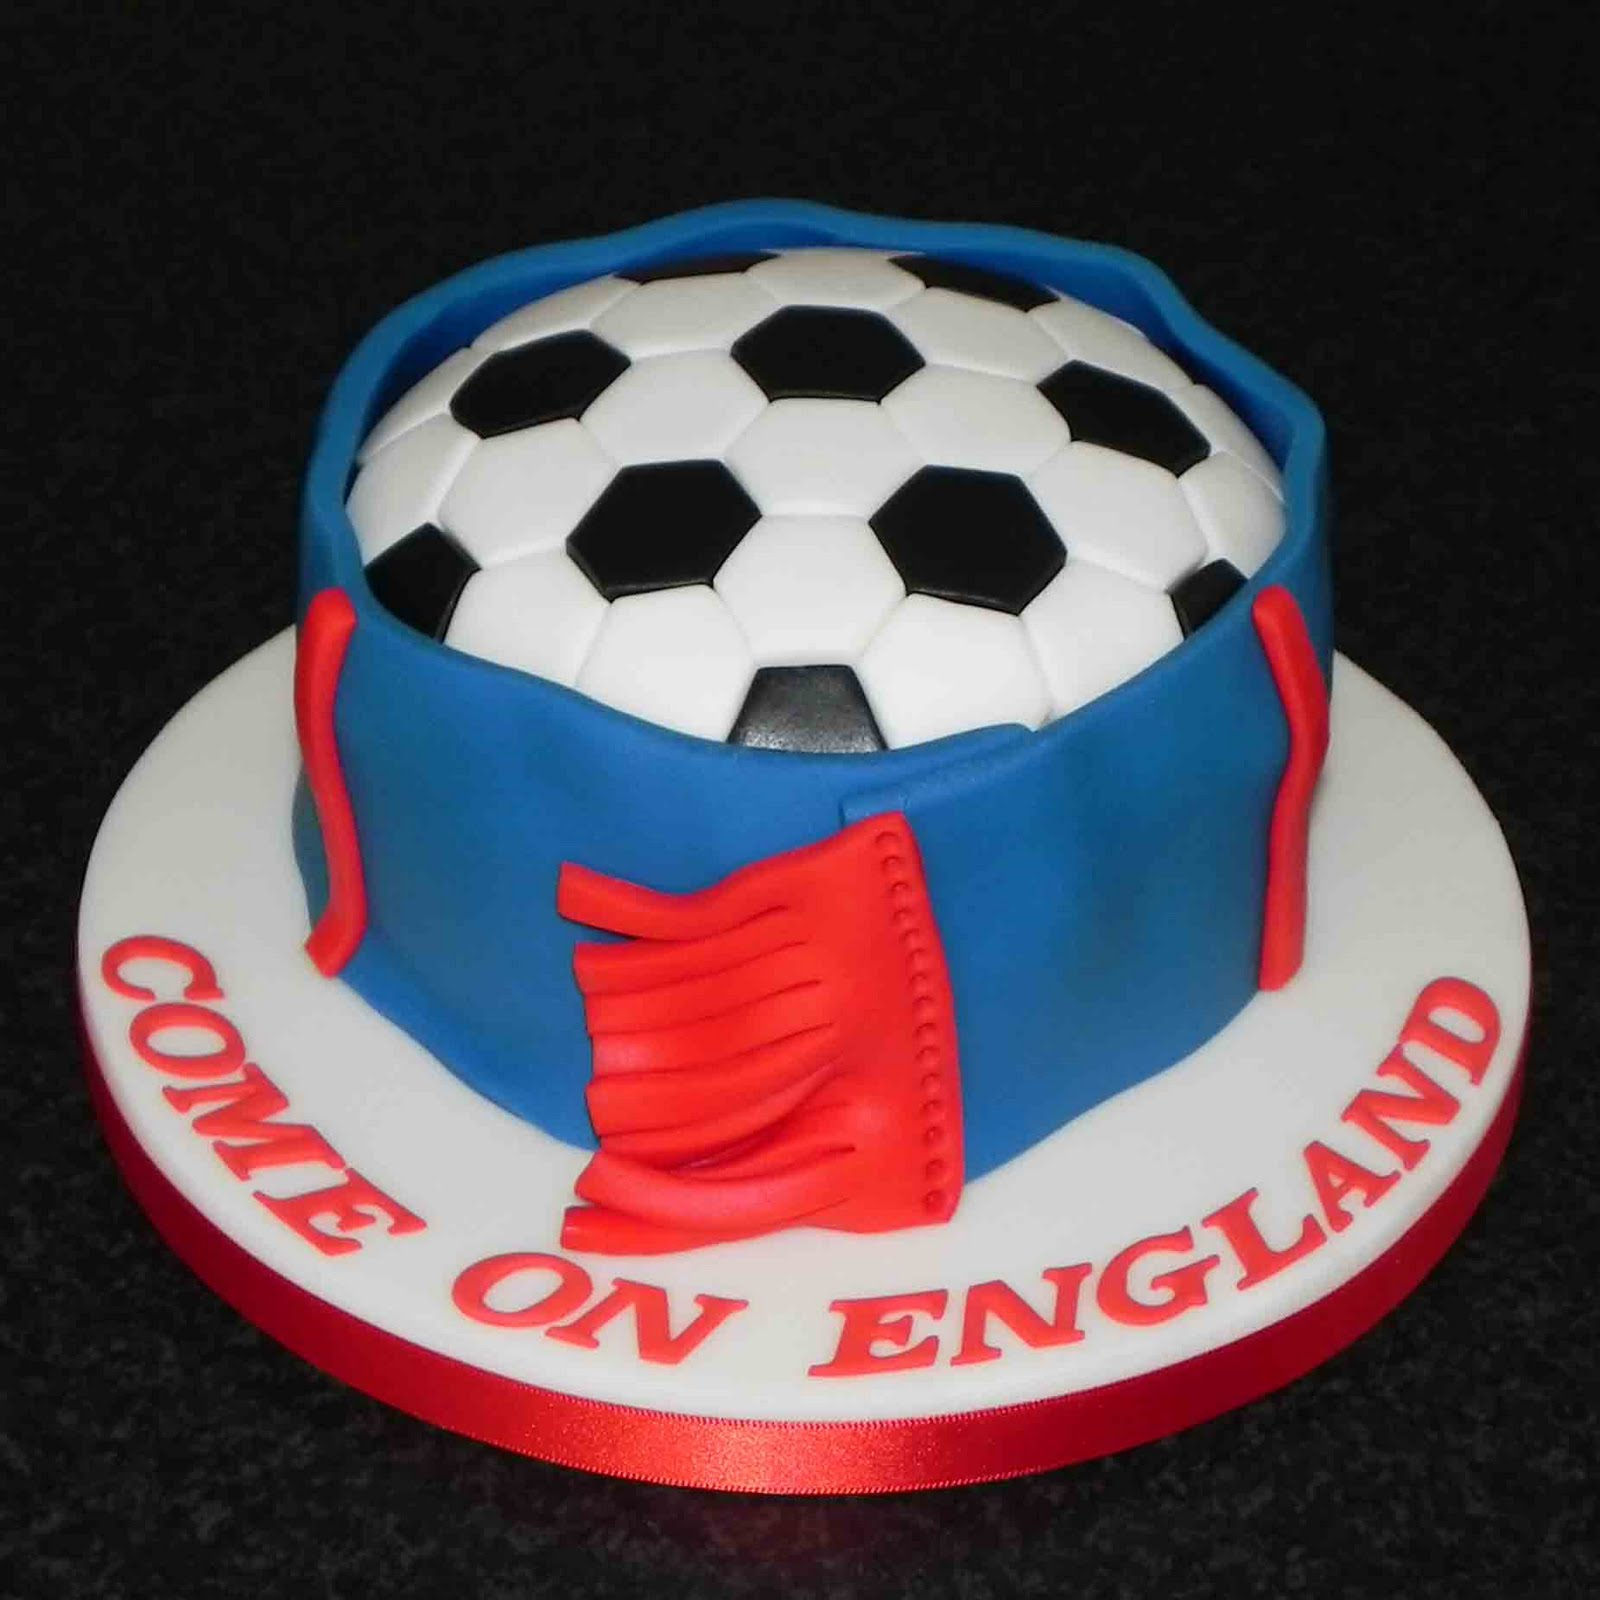 American Football Cake Decoration Uk